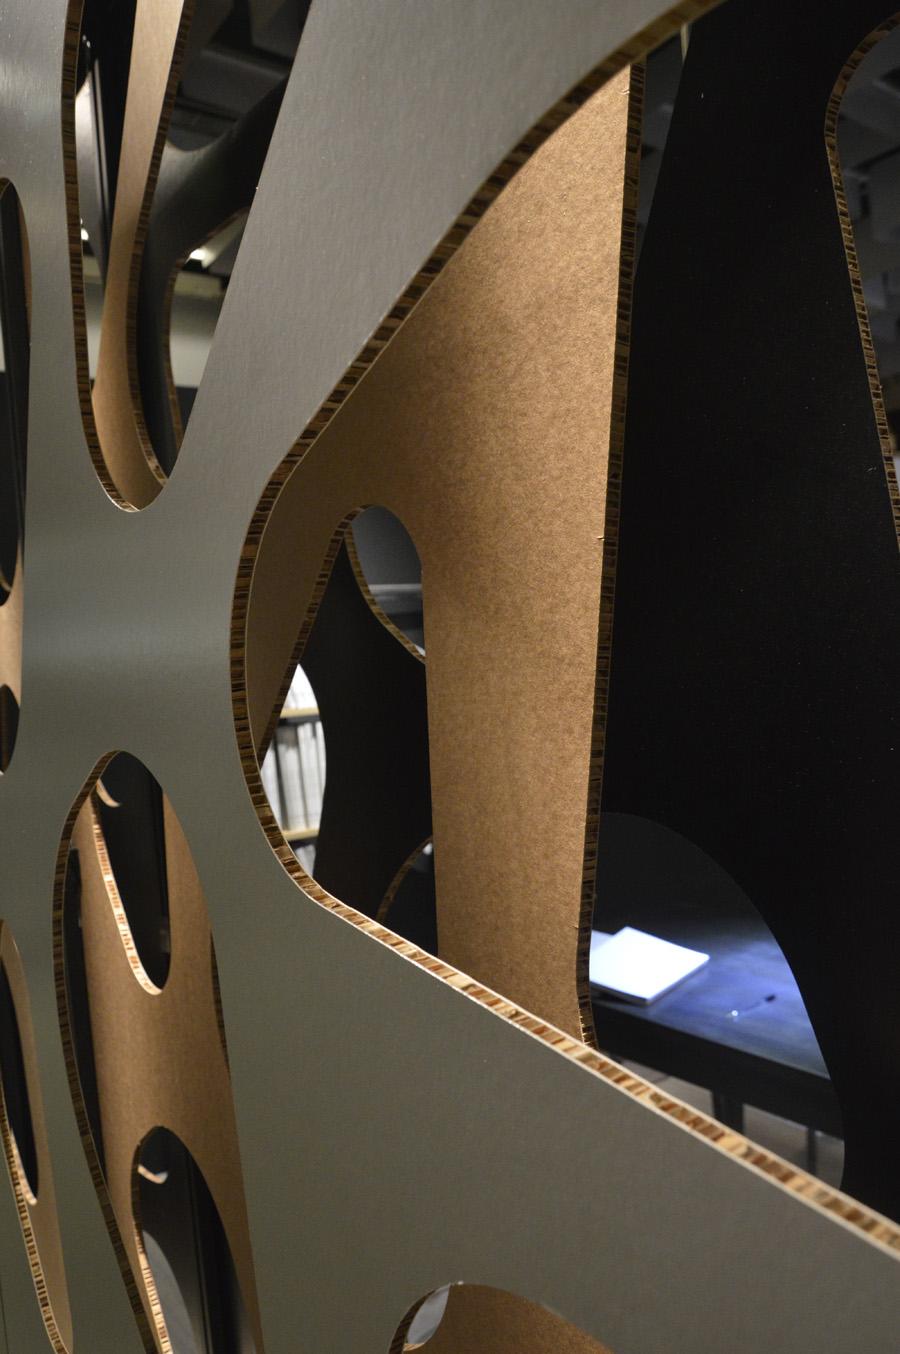 006 alberto grassi design studio biagioli filati pitti